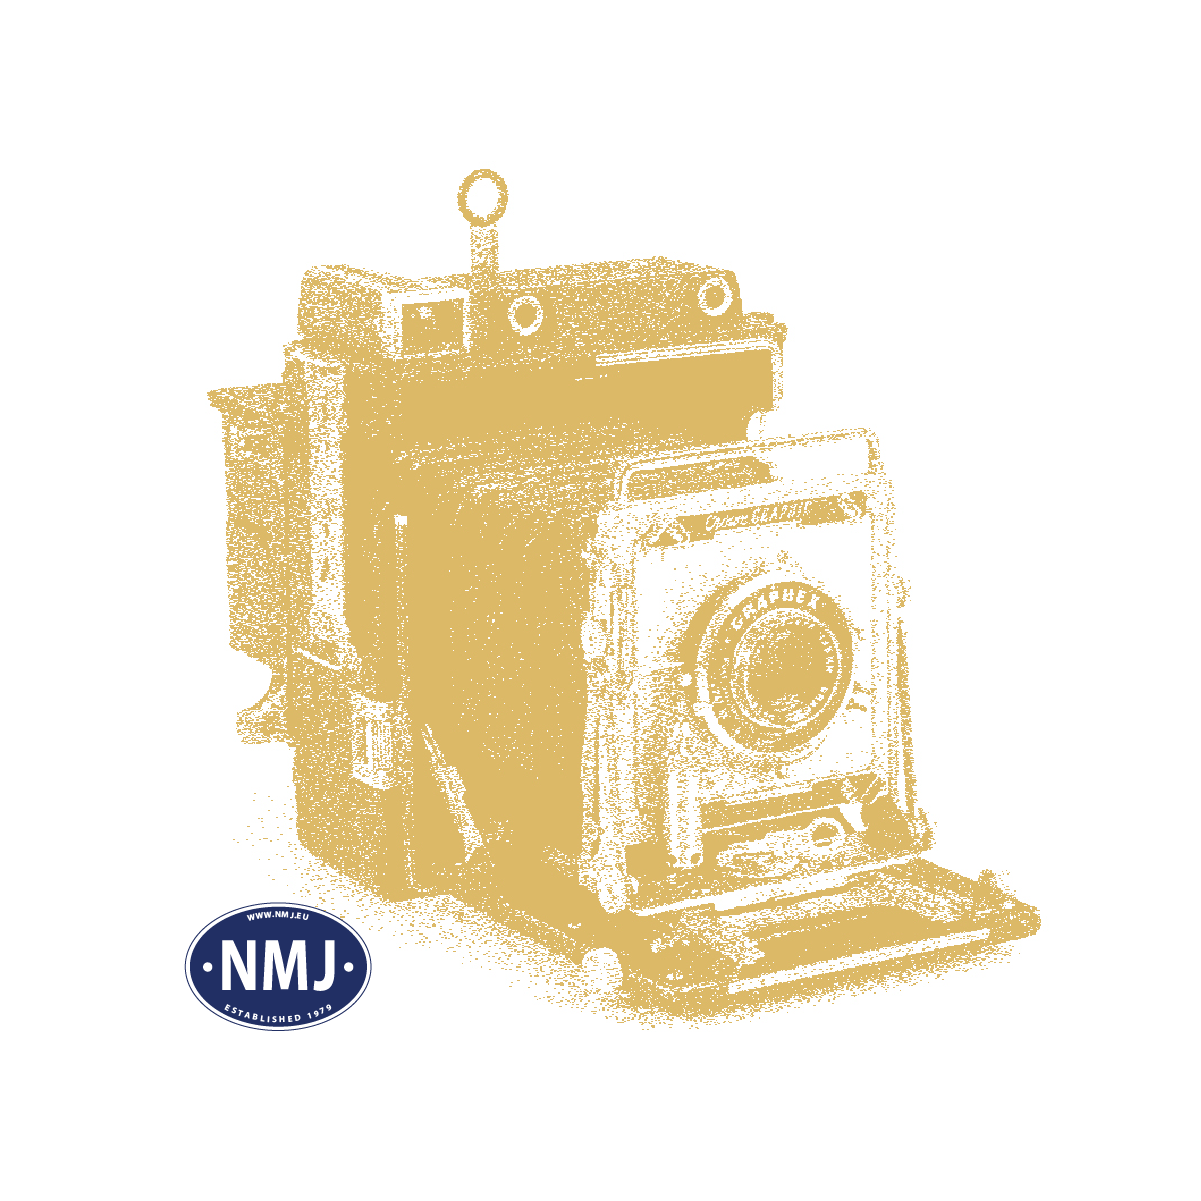 NMJT245001 - NMJ Topline NSB Di3b 641 rotbrauner Farbgebung, 0-Skala, DCC Sound